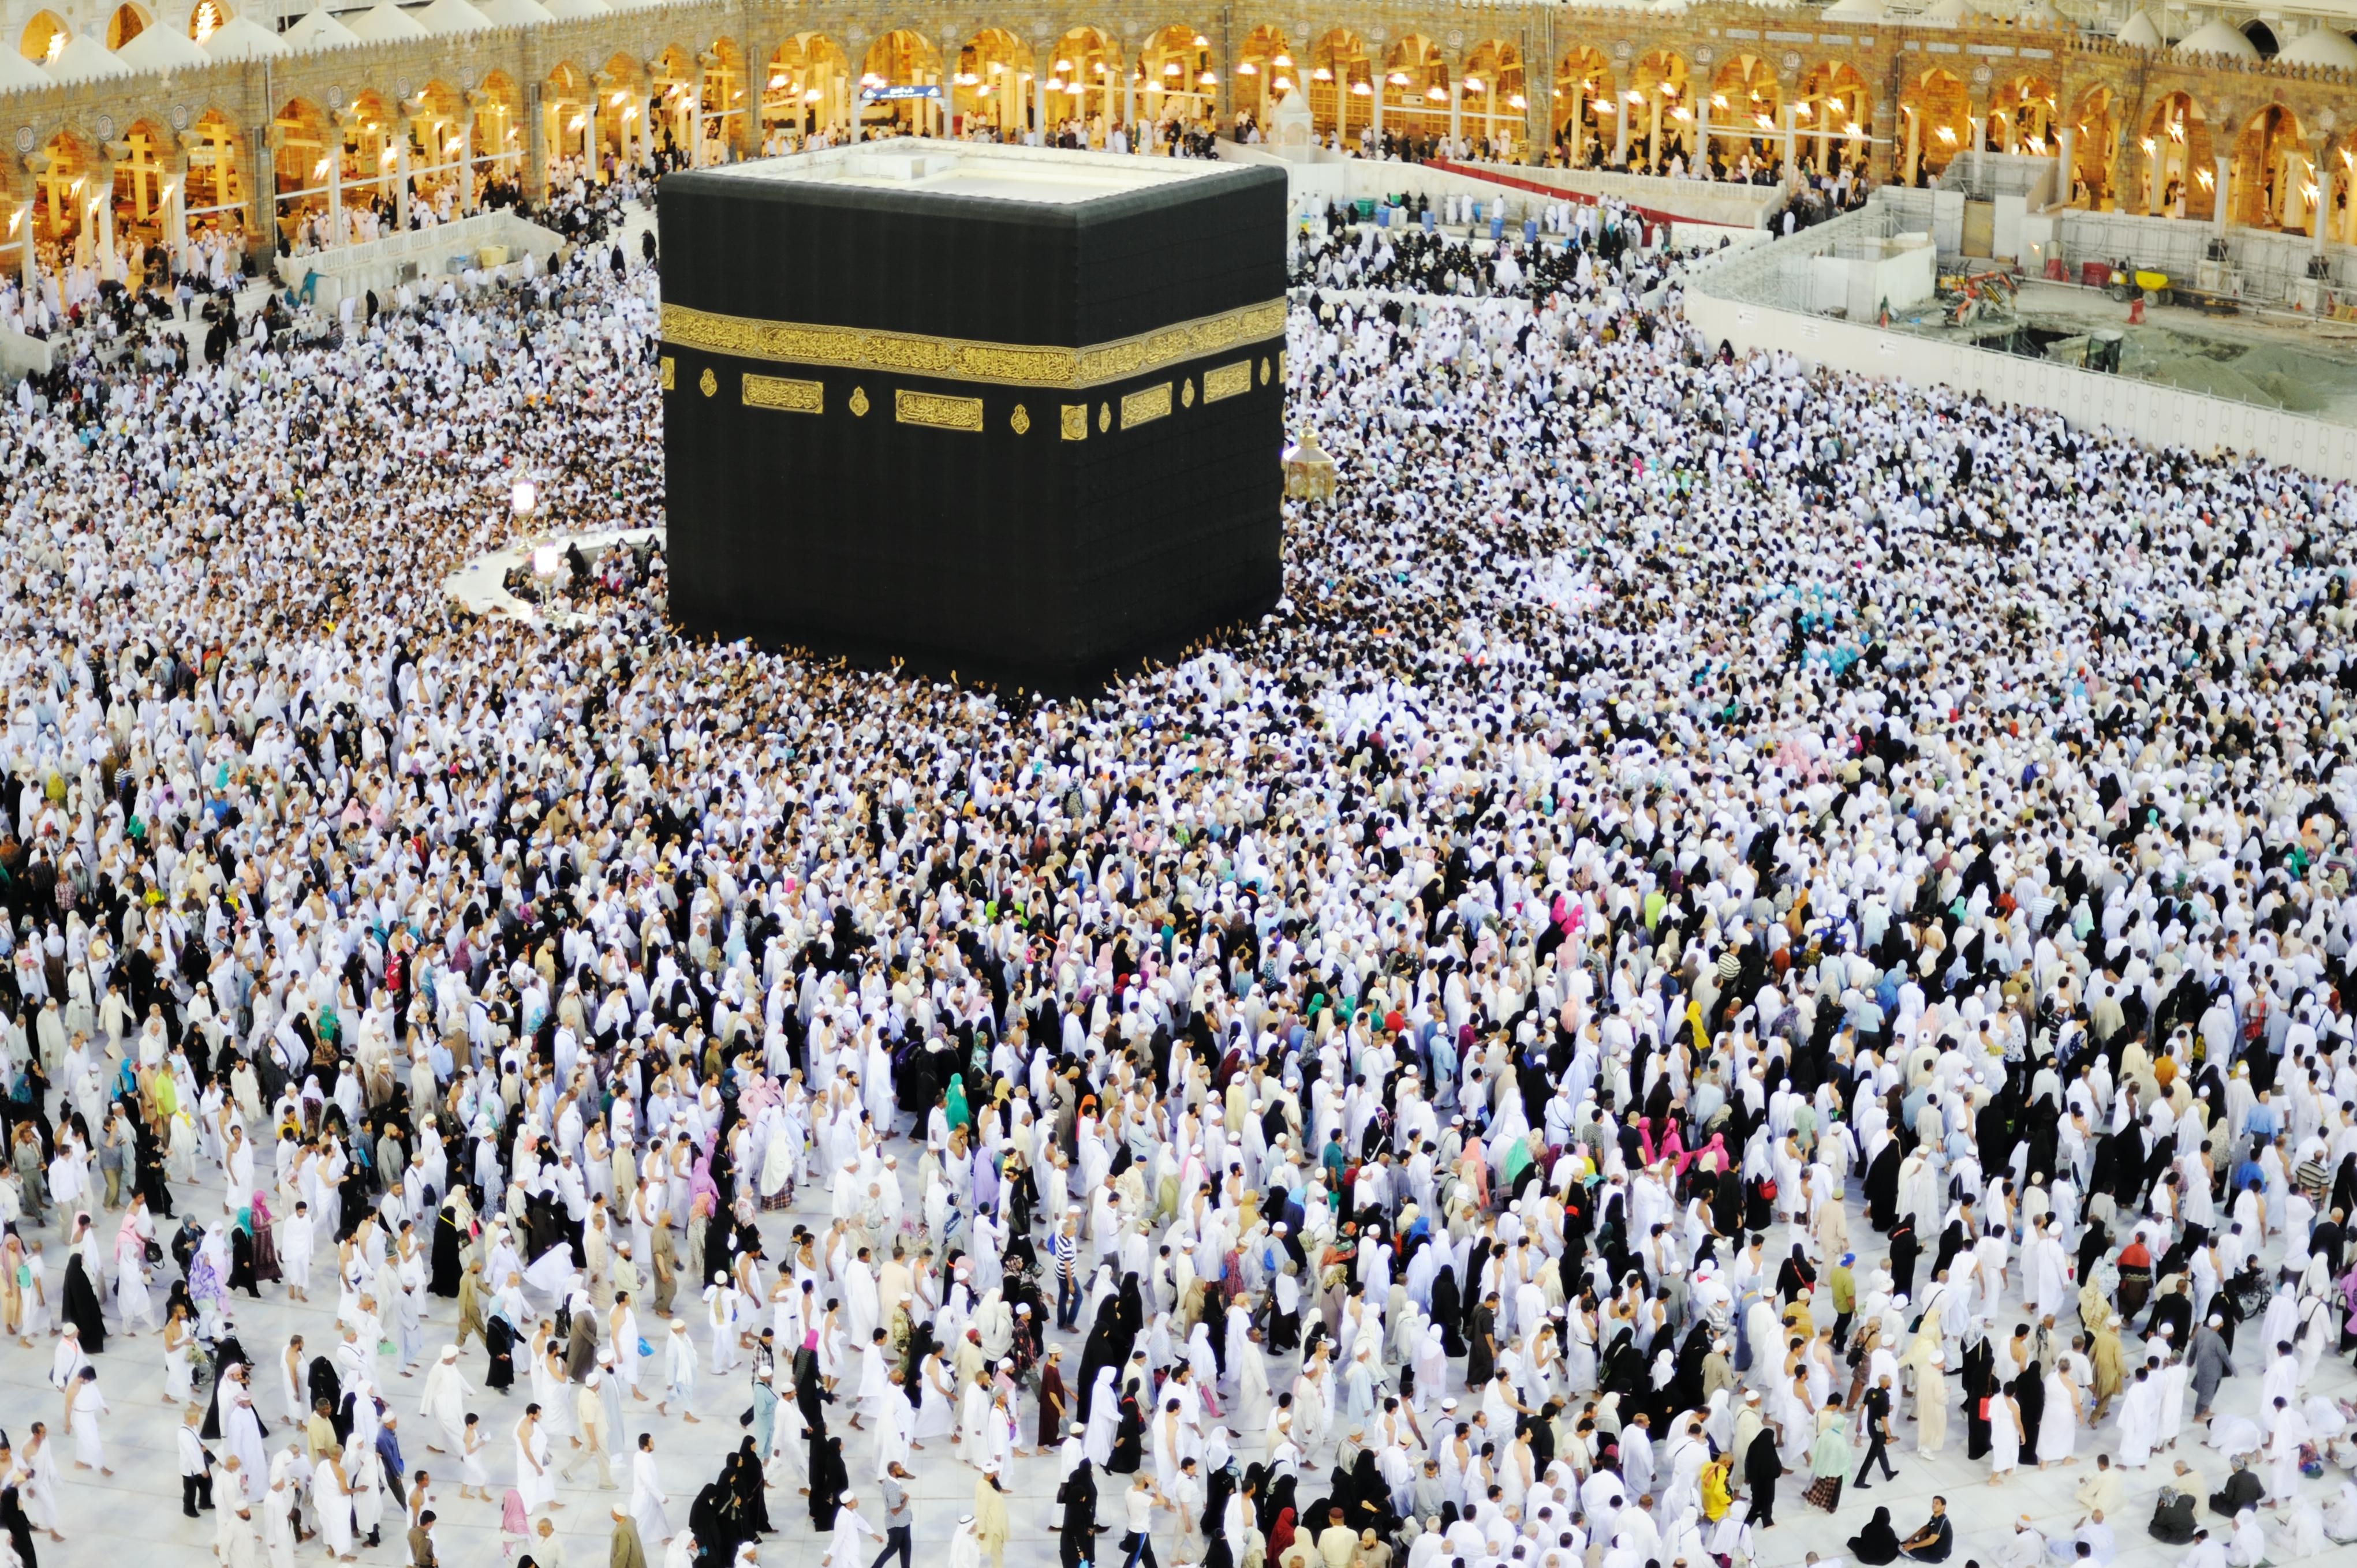 What is Hajj Application Date 2020 from Pakistan?